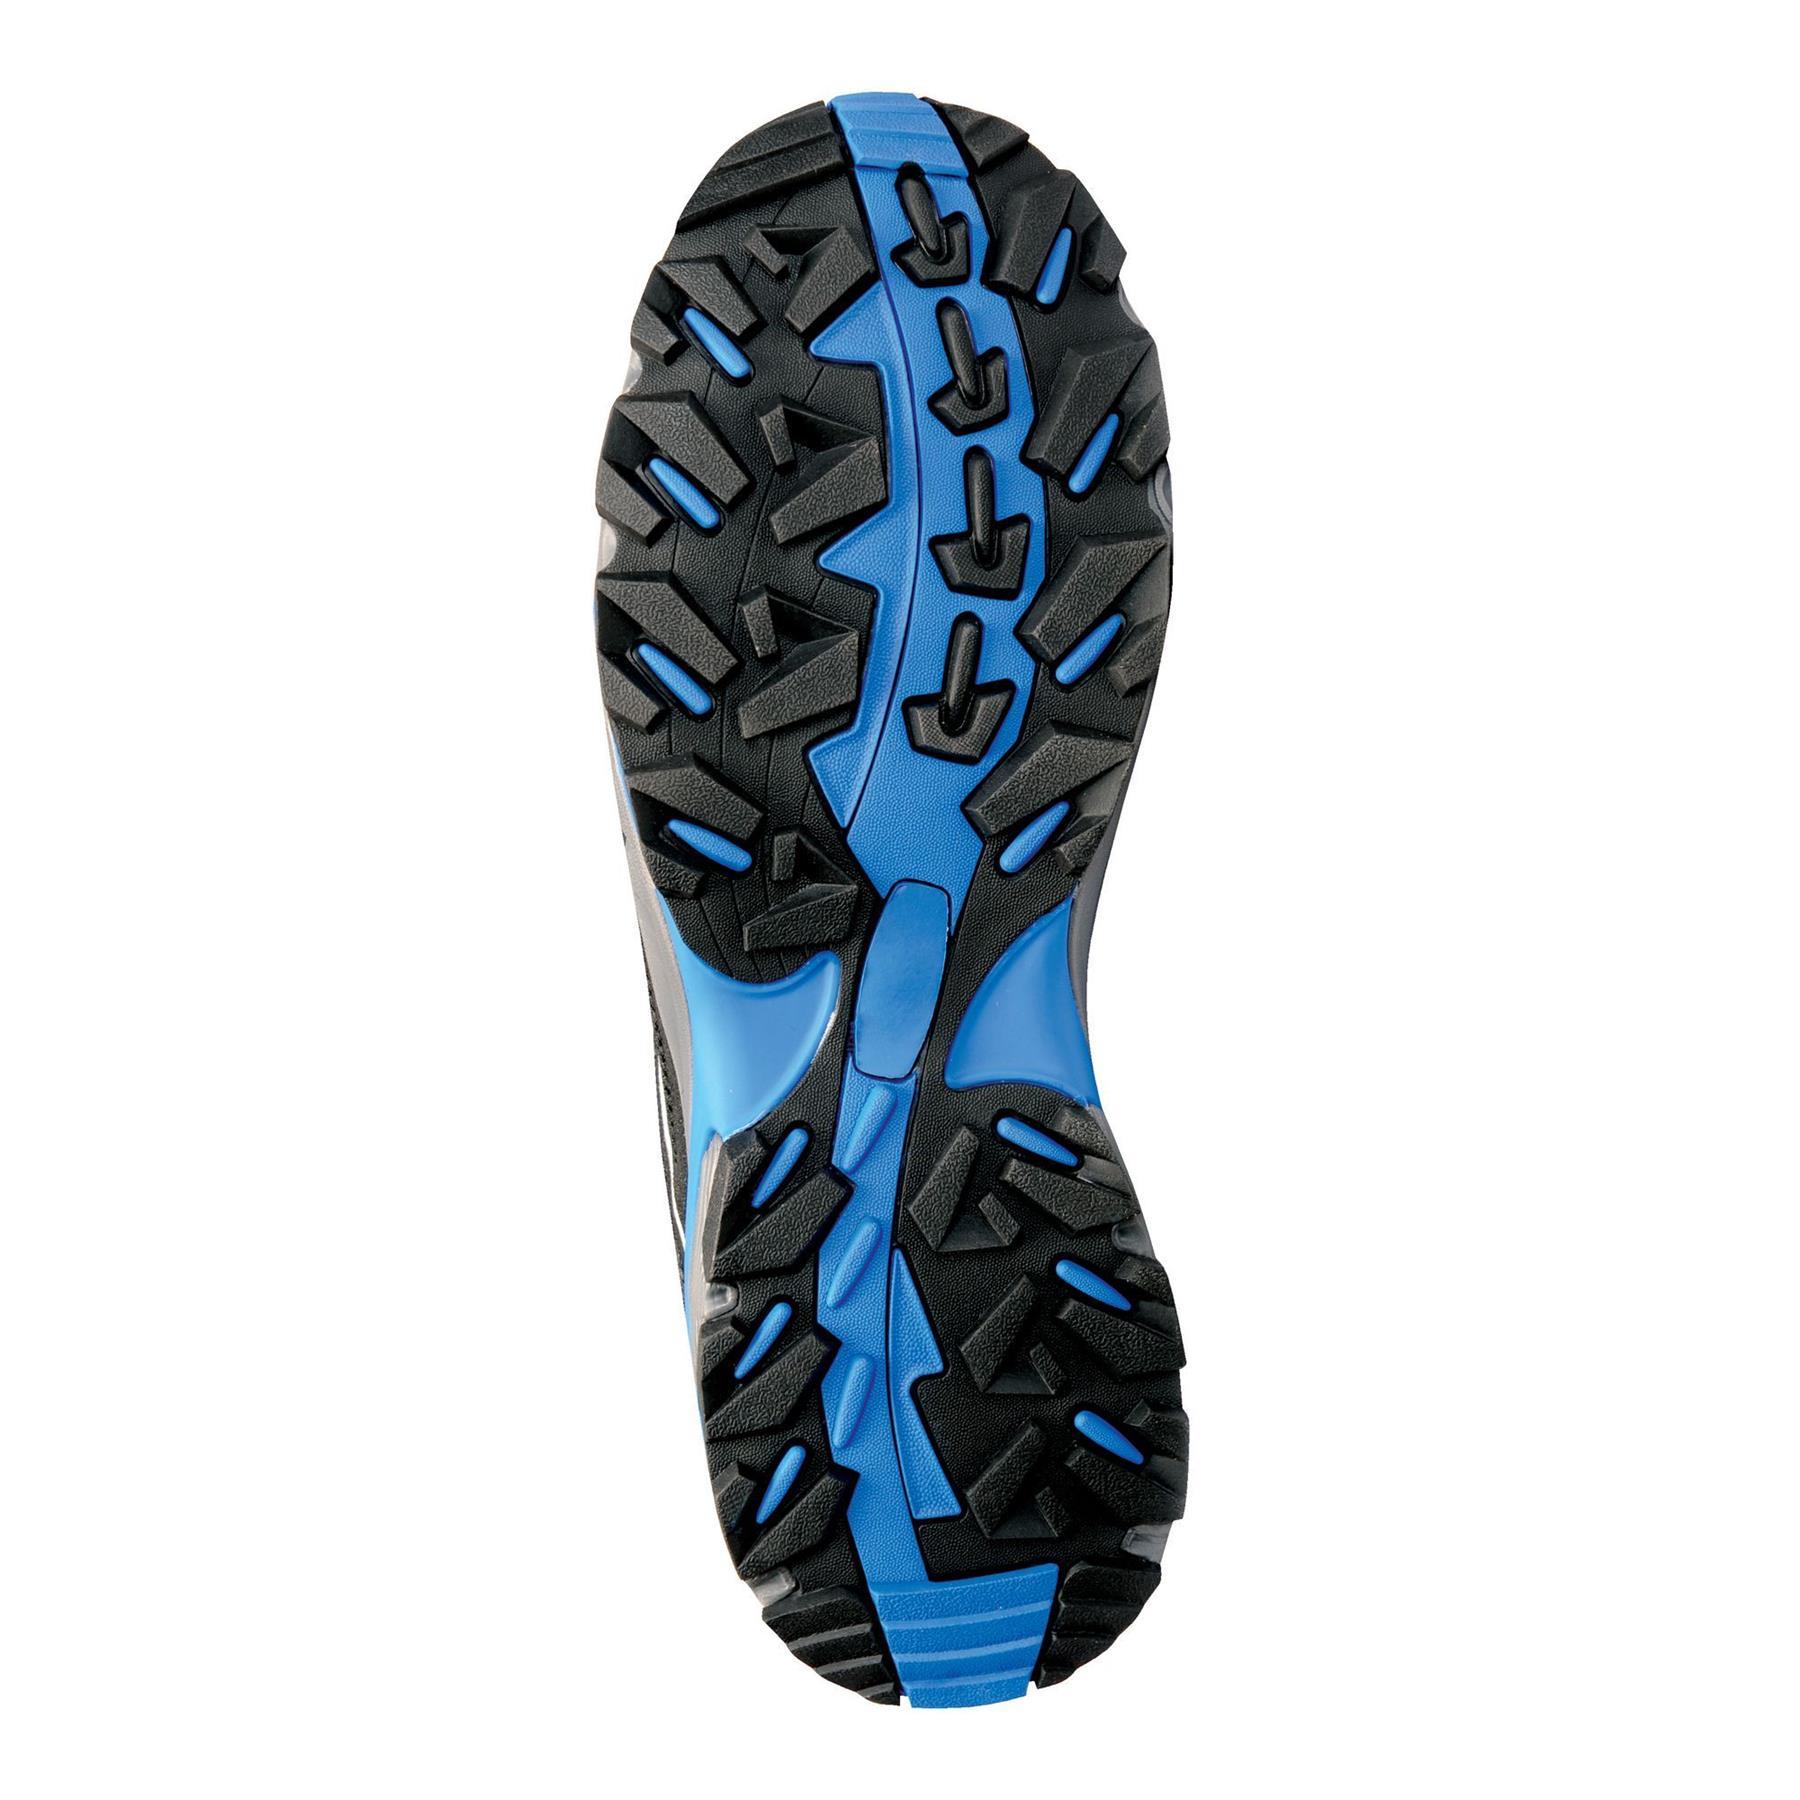 miniatuur 9 - Regatta Mens Work Safety Protective Shoes Steel Toe Cap Boots Workwear